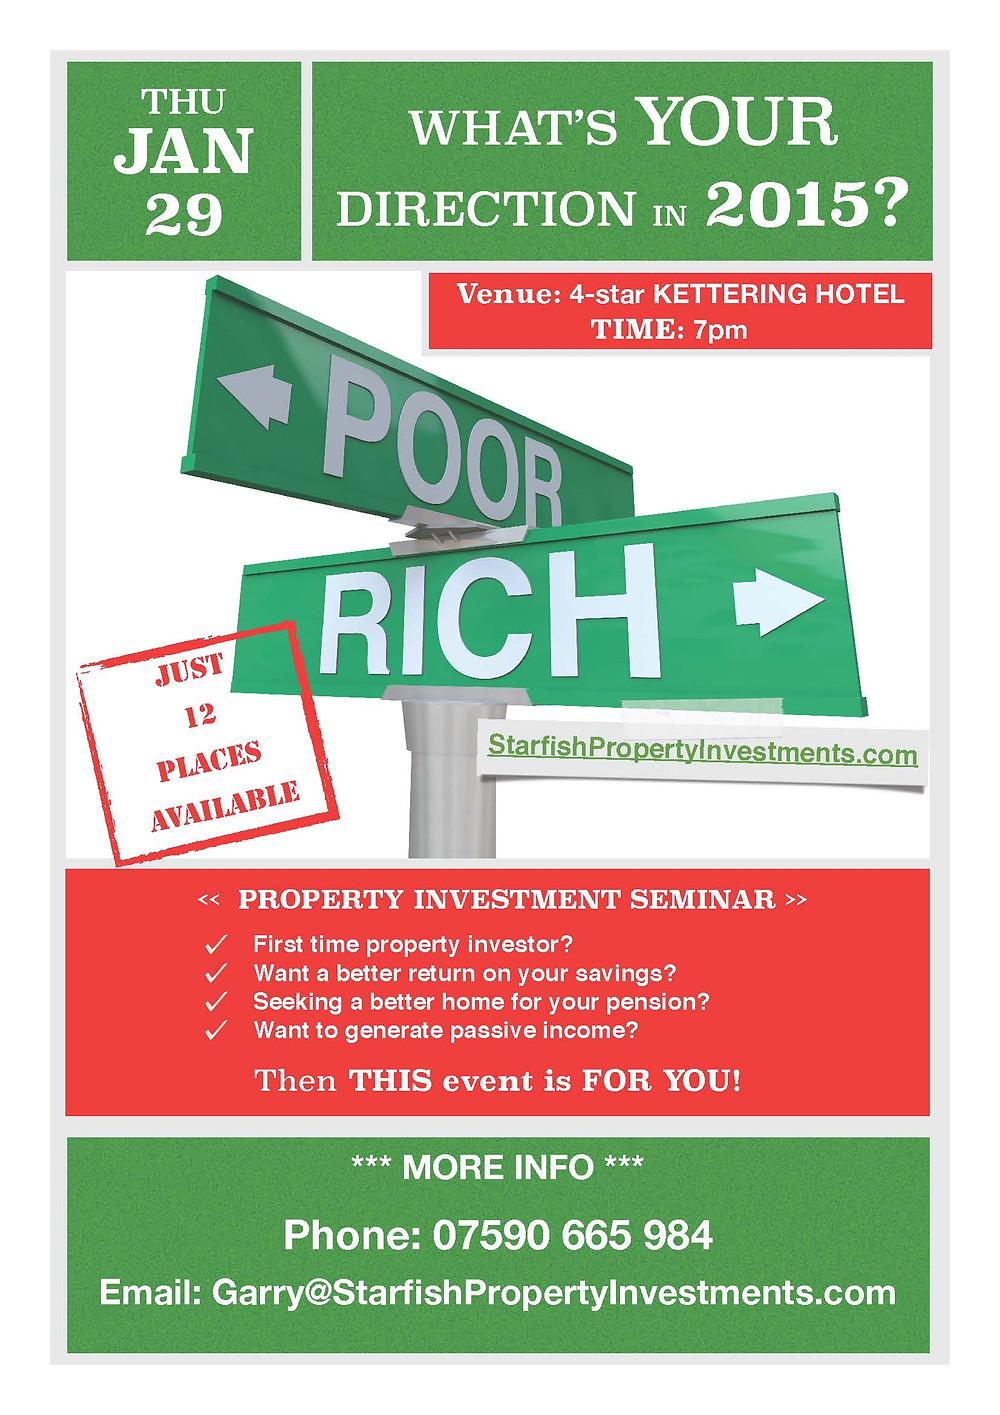 High Yielding Investment Seminar 2015